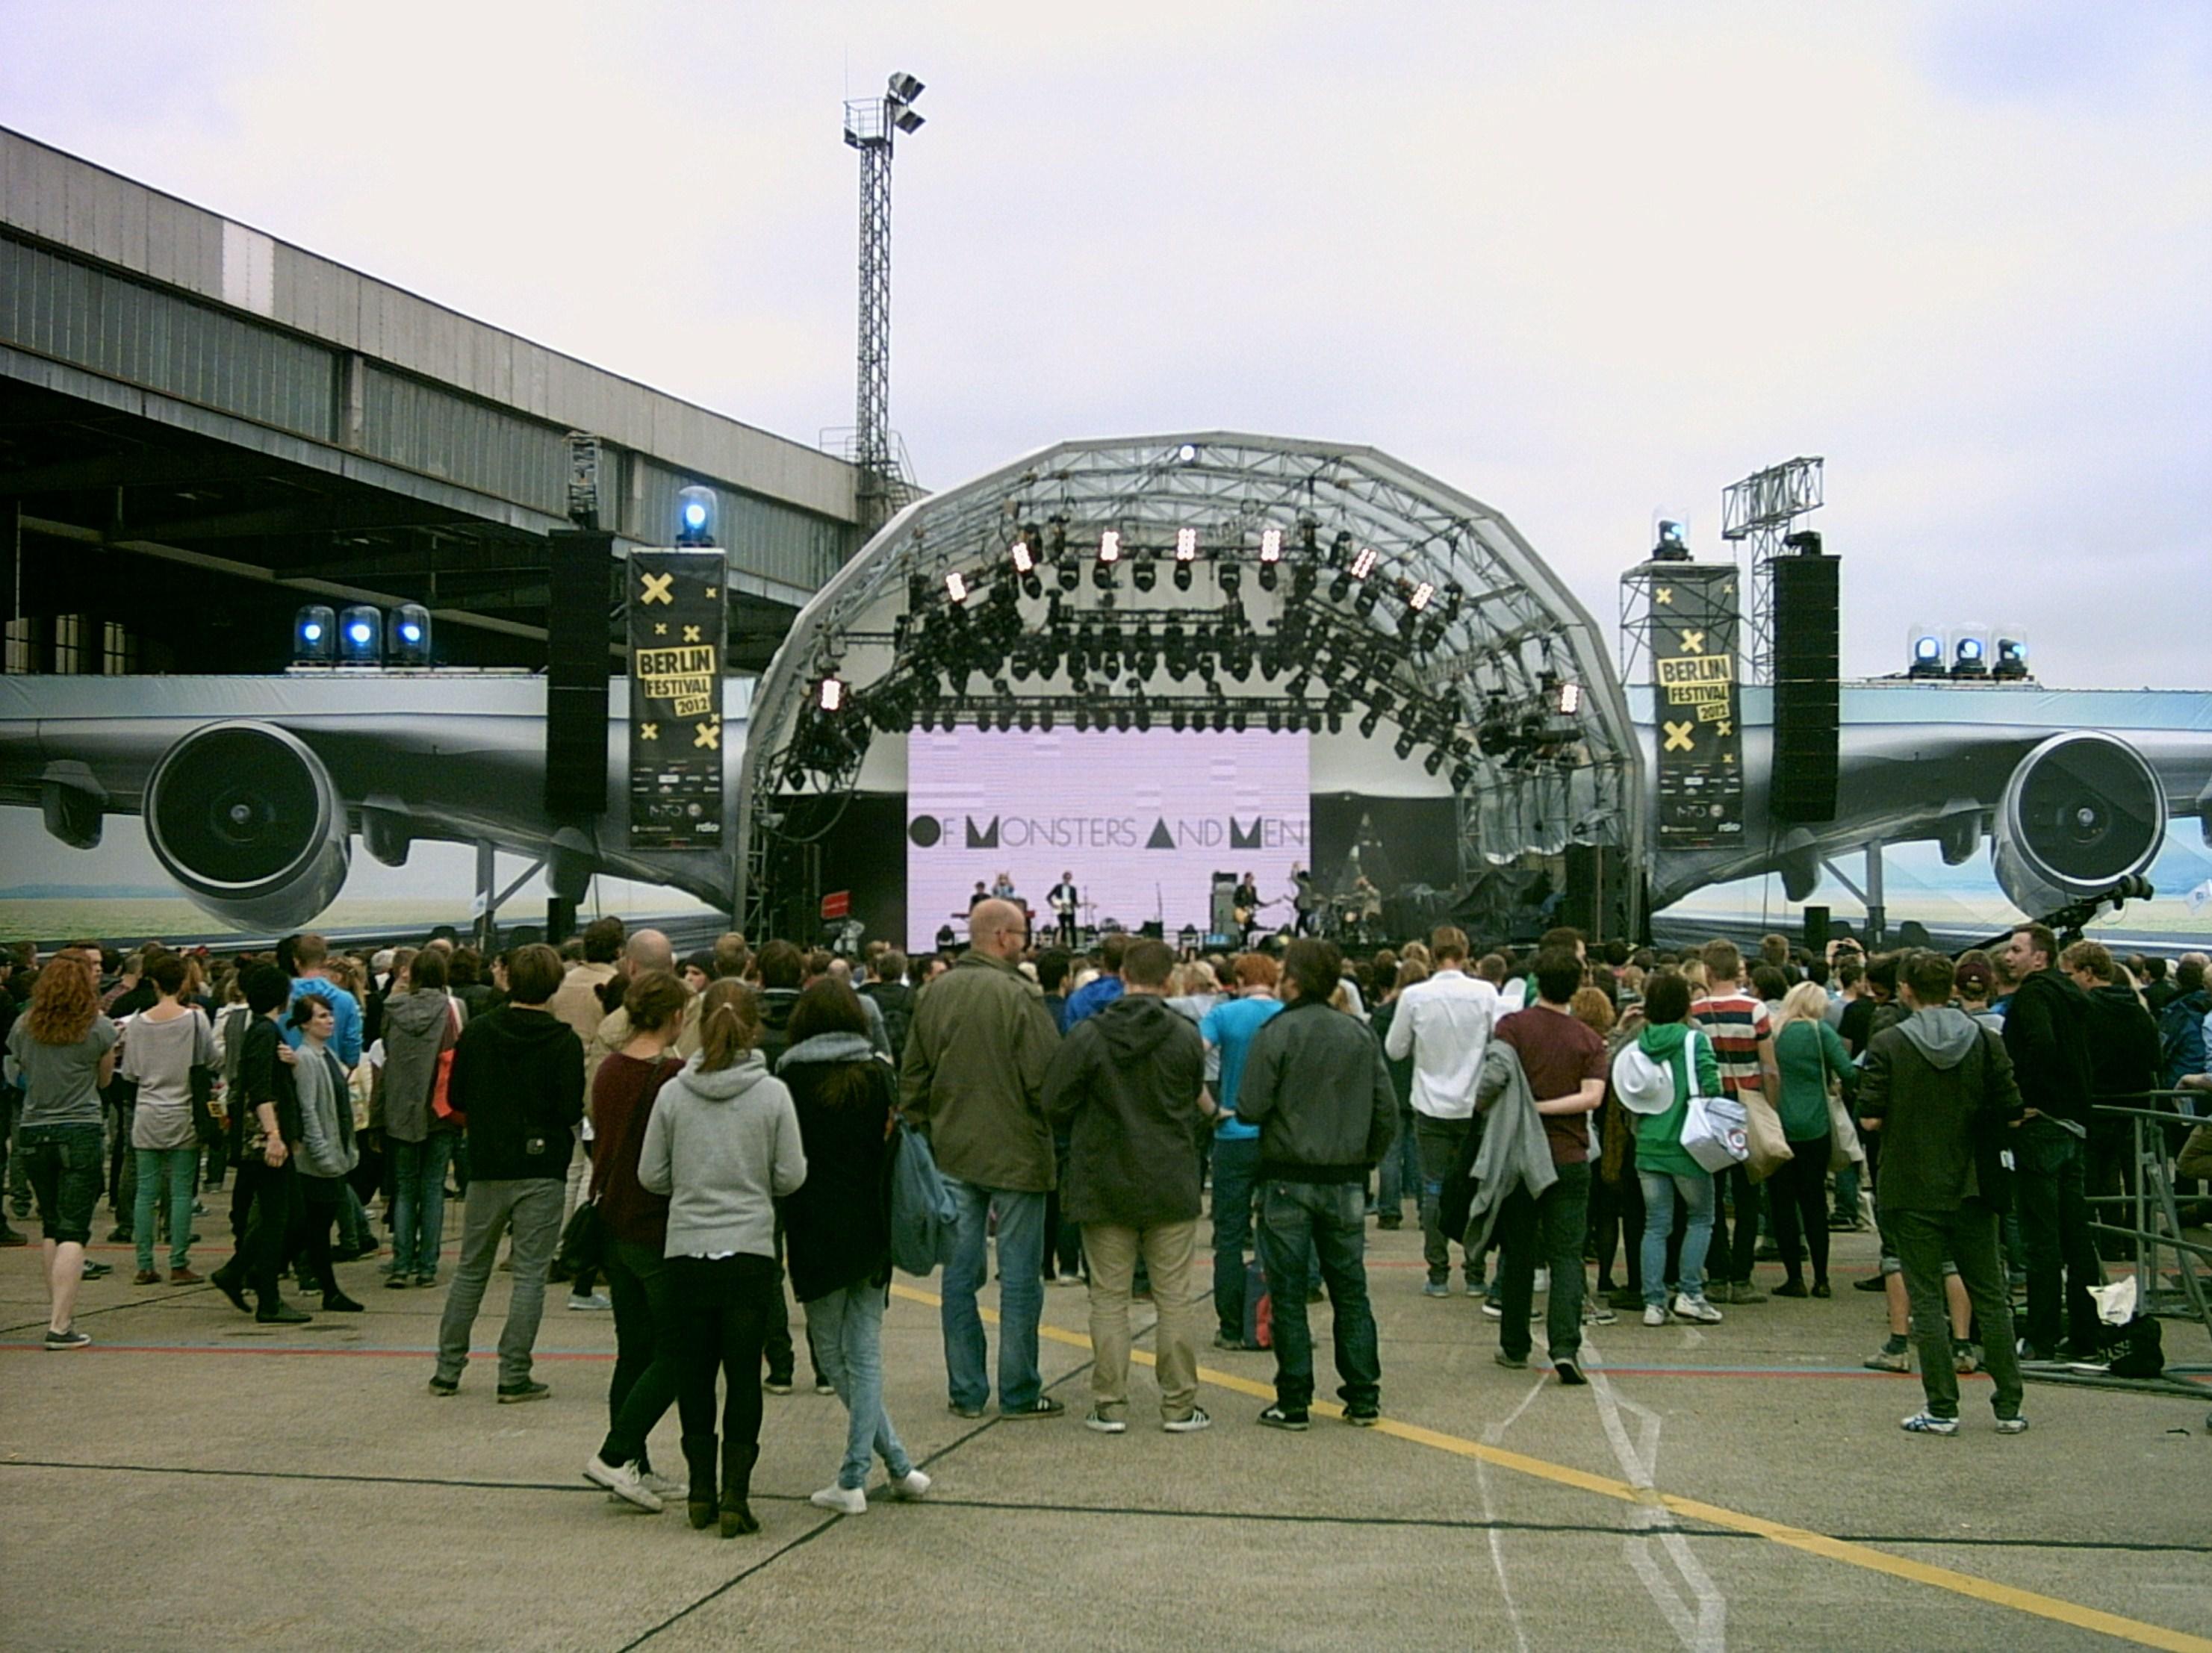 Berlin 2012